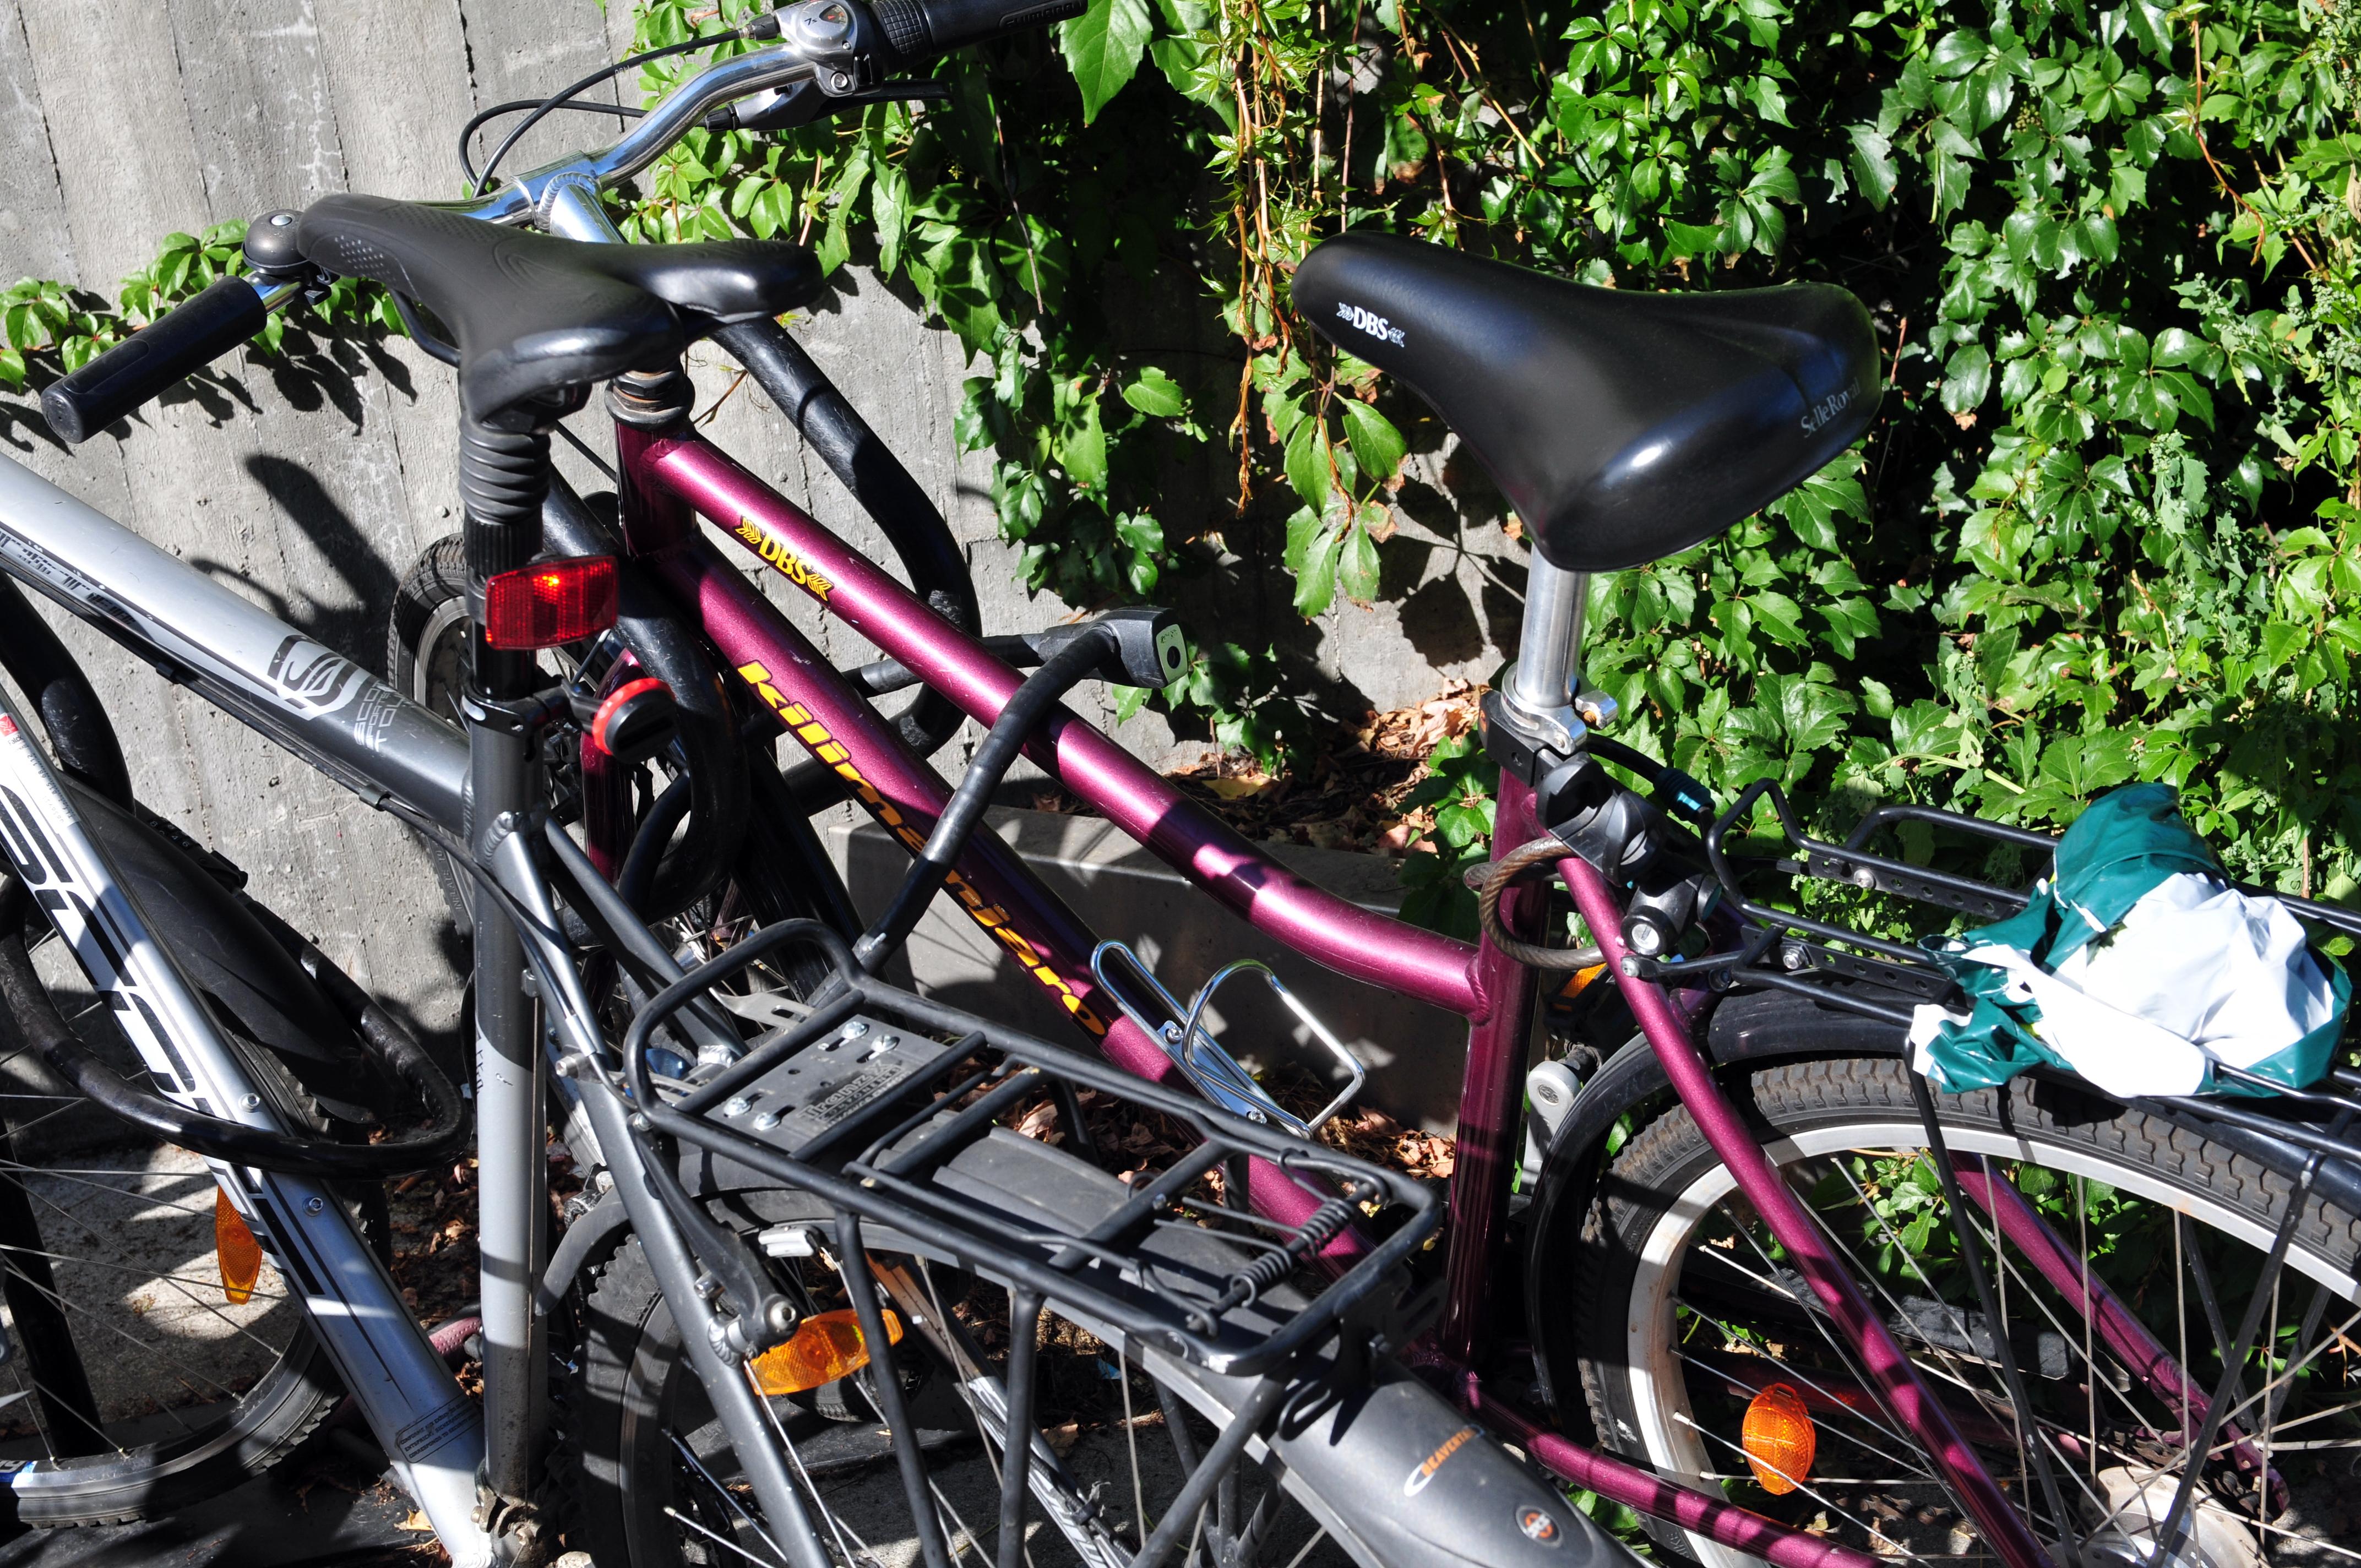 14-09-02-fahrrad-oslo-10.jpg